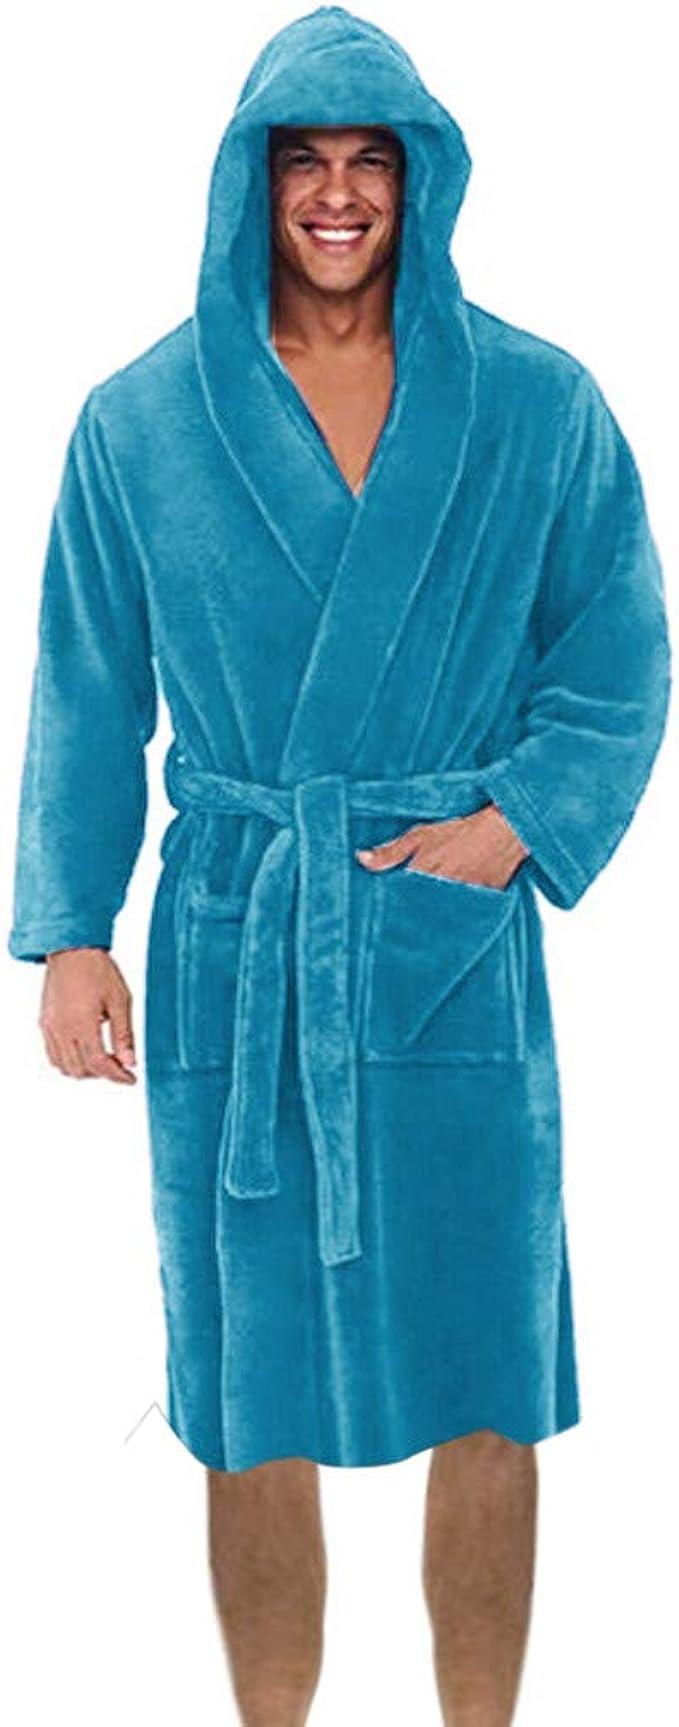 general3 Men Plush Fleece Robe Kimono Bathrobe Soft Shawl Long Sleeve Robe Collar Warm Robe Sleepwear Dress